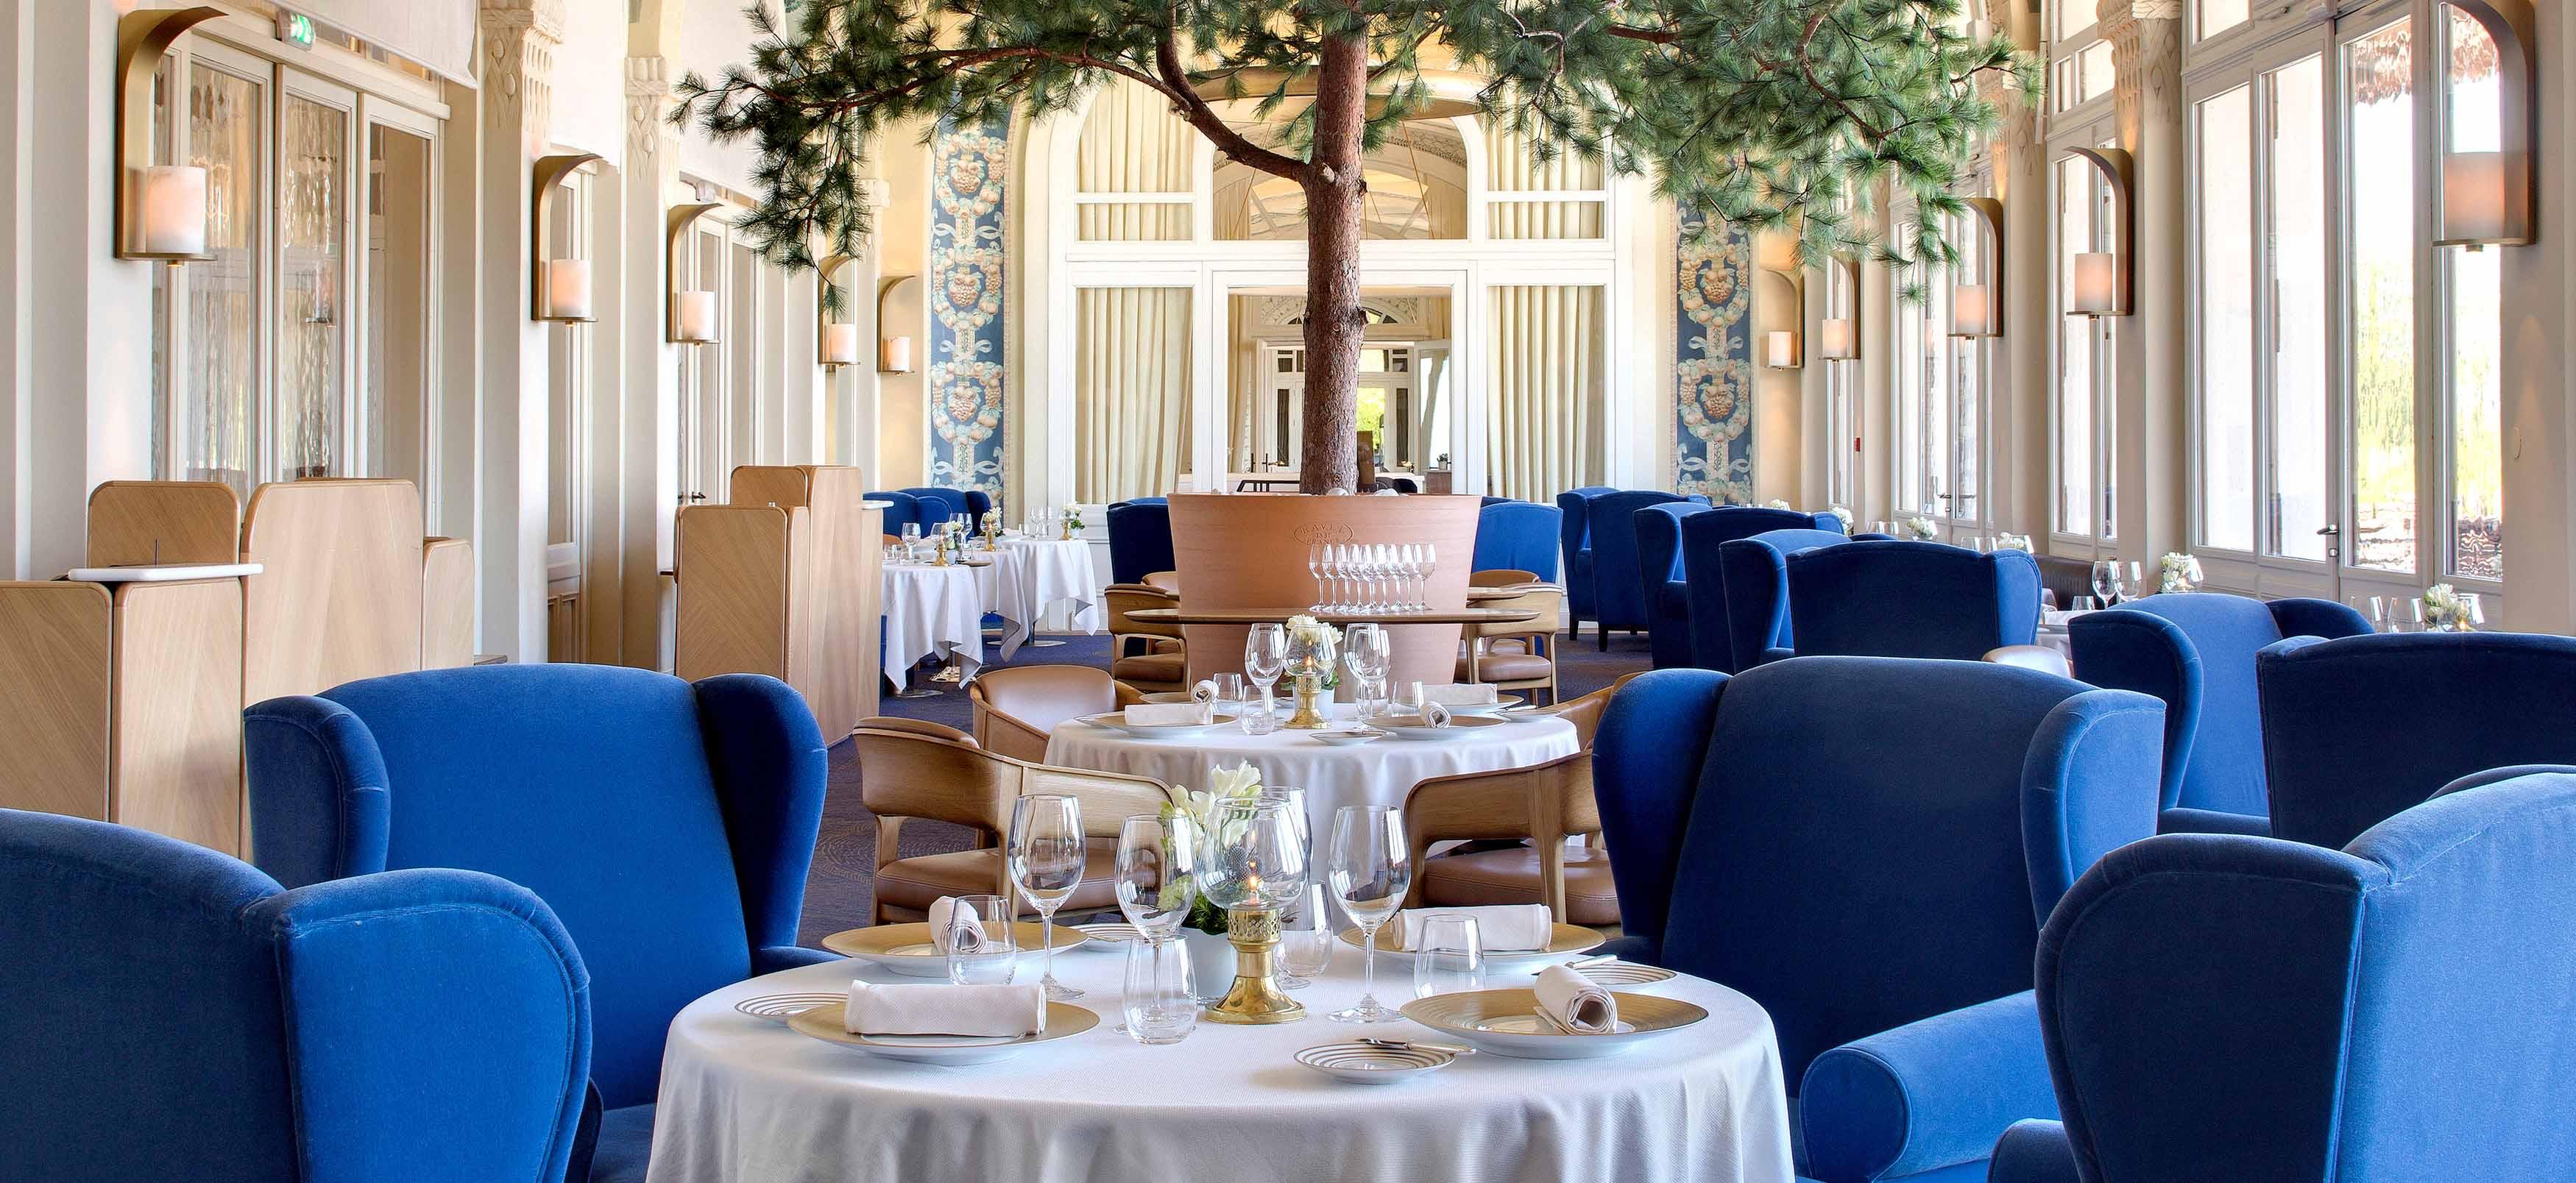 Gastronomic restaurant Les Fresques 5 star Hotel ROYAL